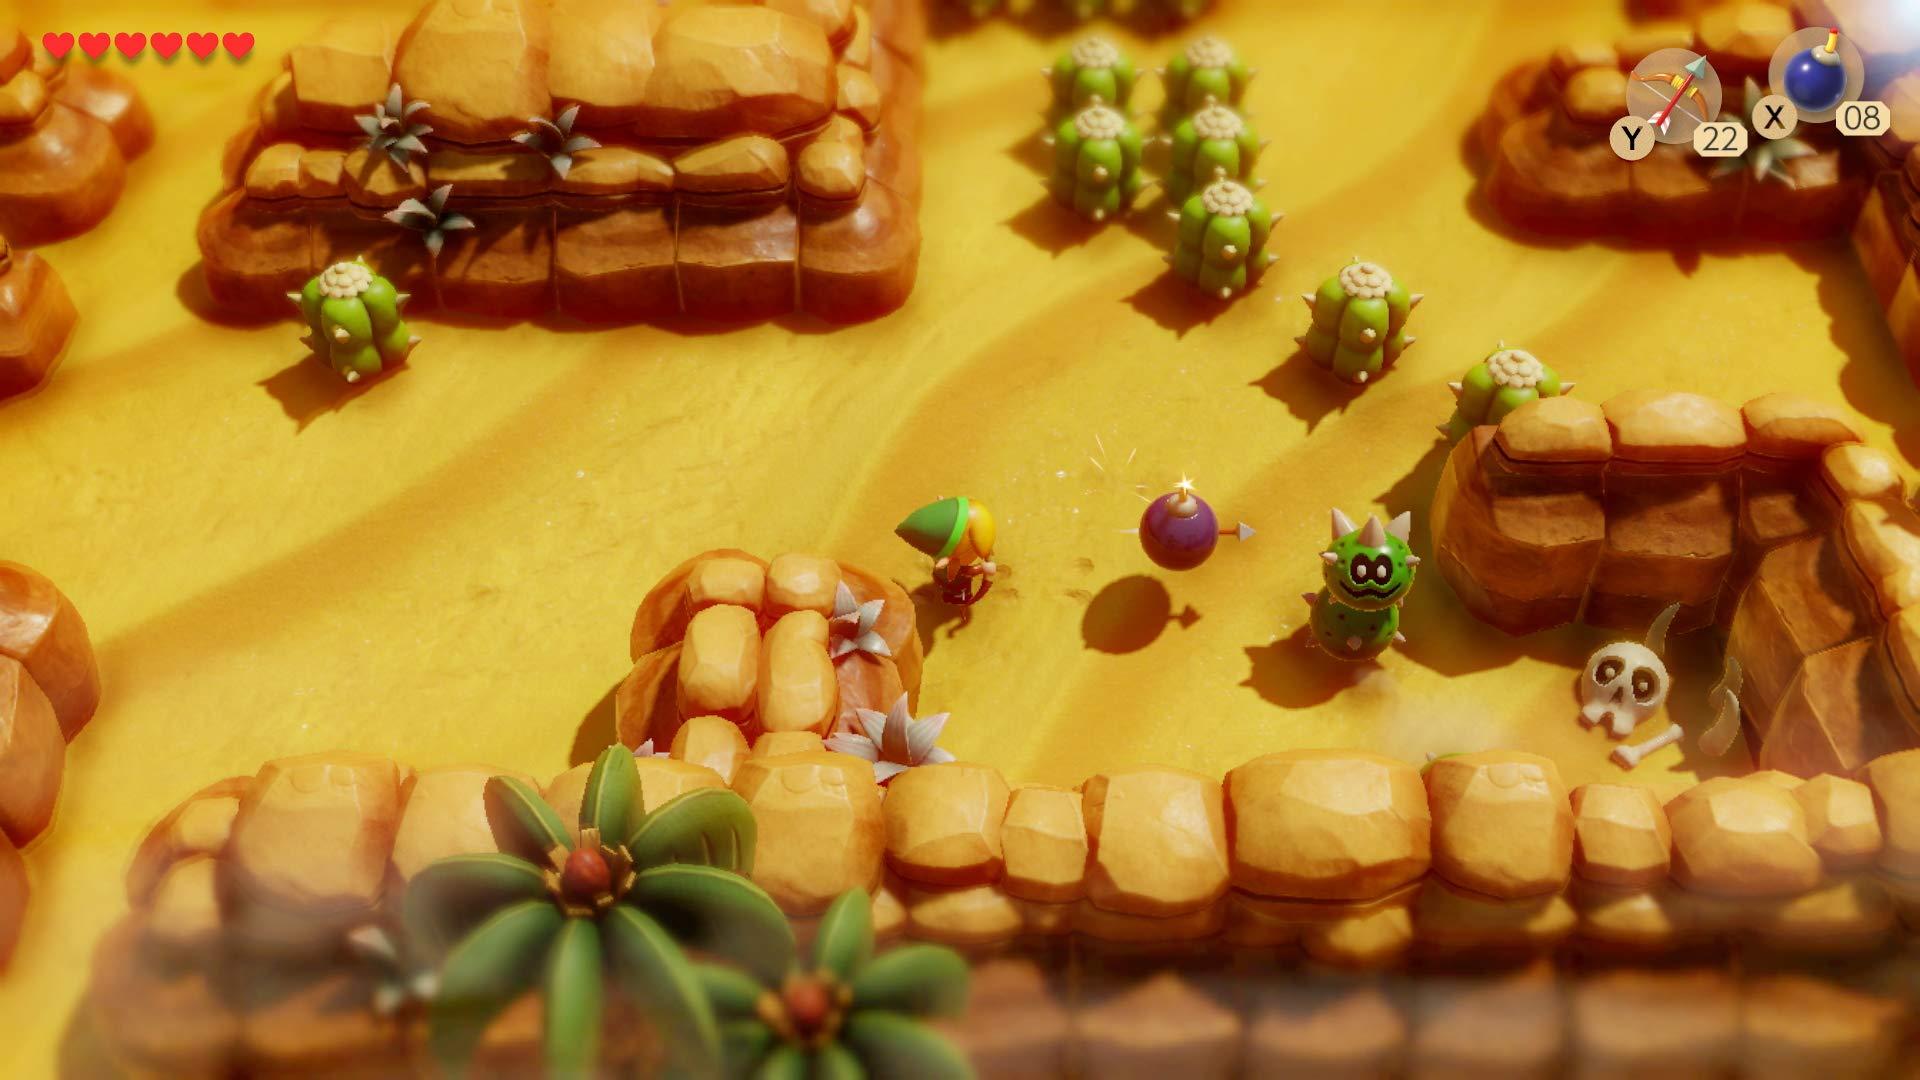 Legend of Zelda Link's Awakening - Nintendo Switch by Nintendo (Image #9)